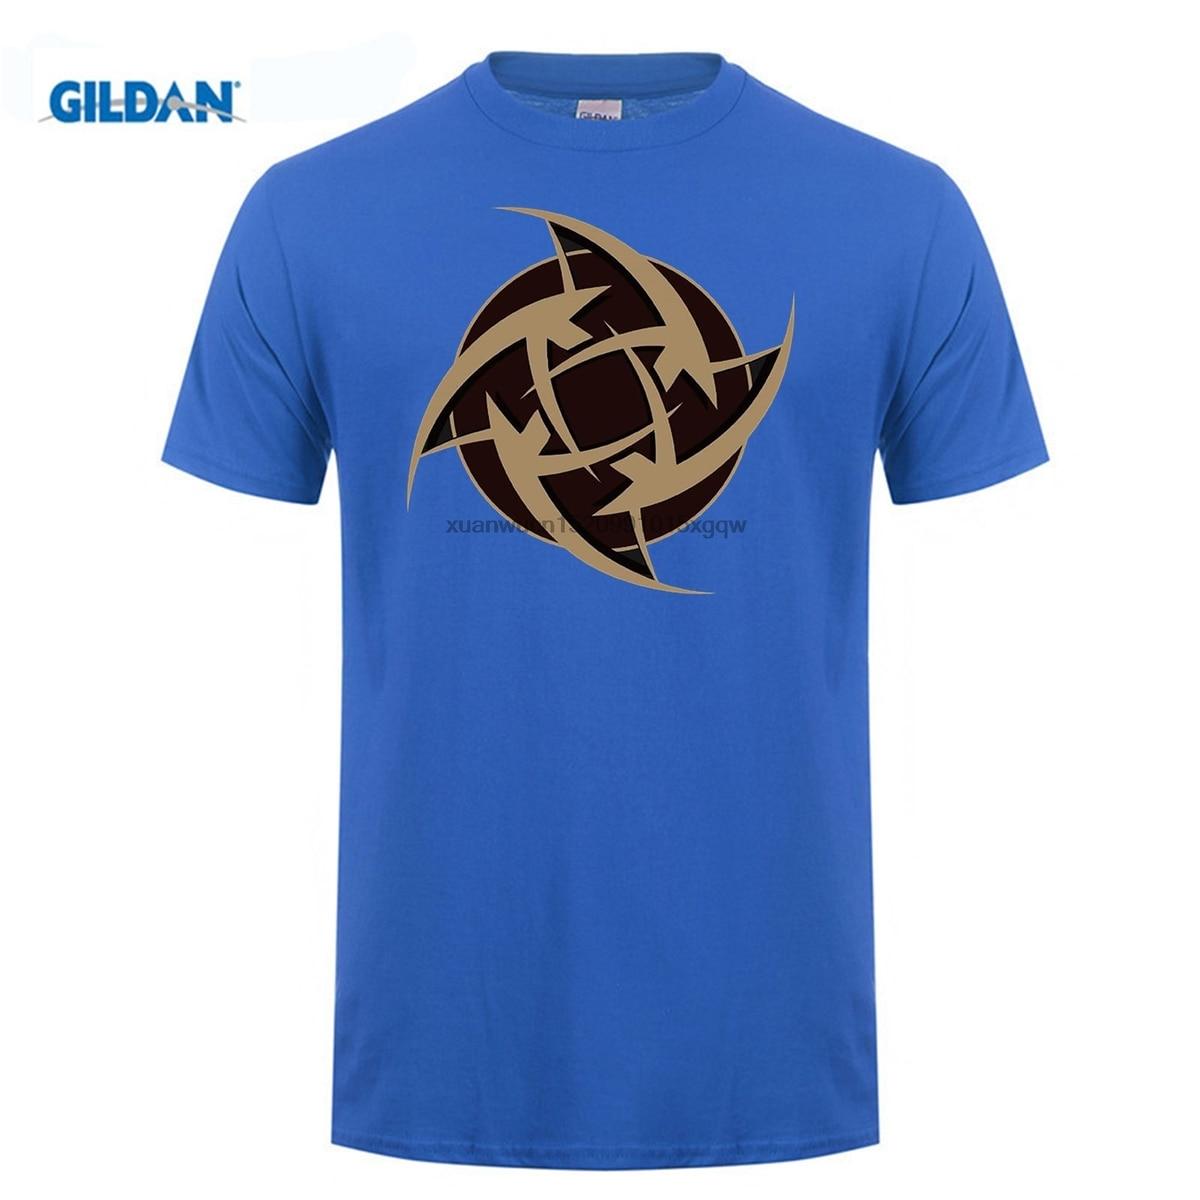 GILDAN Different Colours High Quality Men 39 s Csgo Team Ninjas In Pyjamas Logo Tee Shirts Black in T Shirts from Men 39 s Clothing